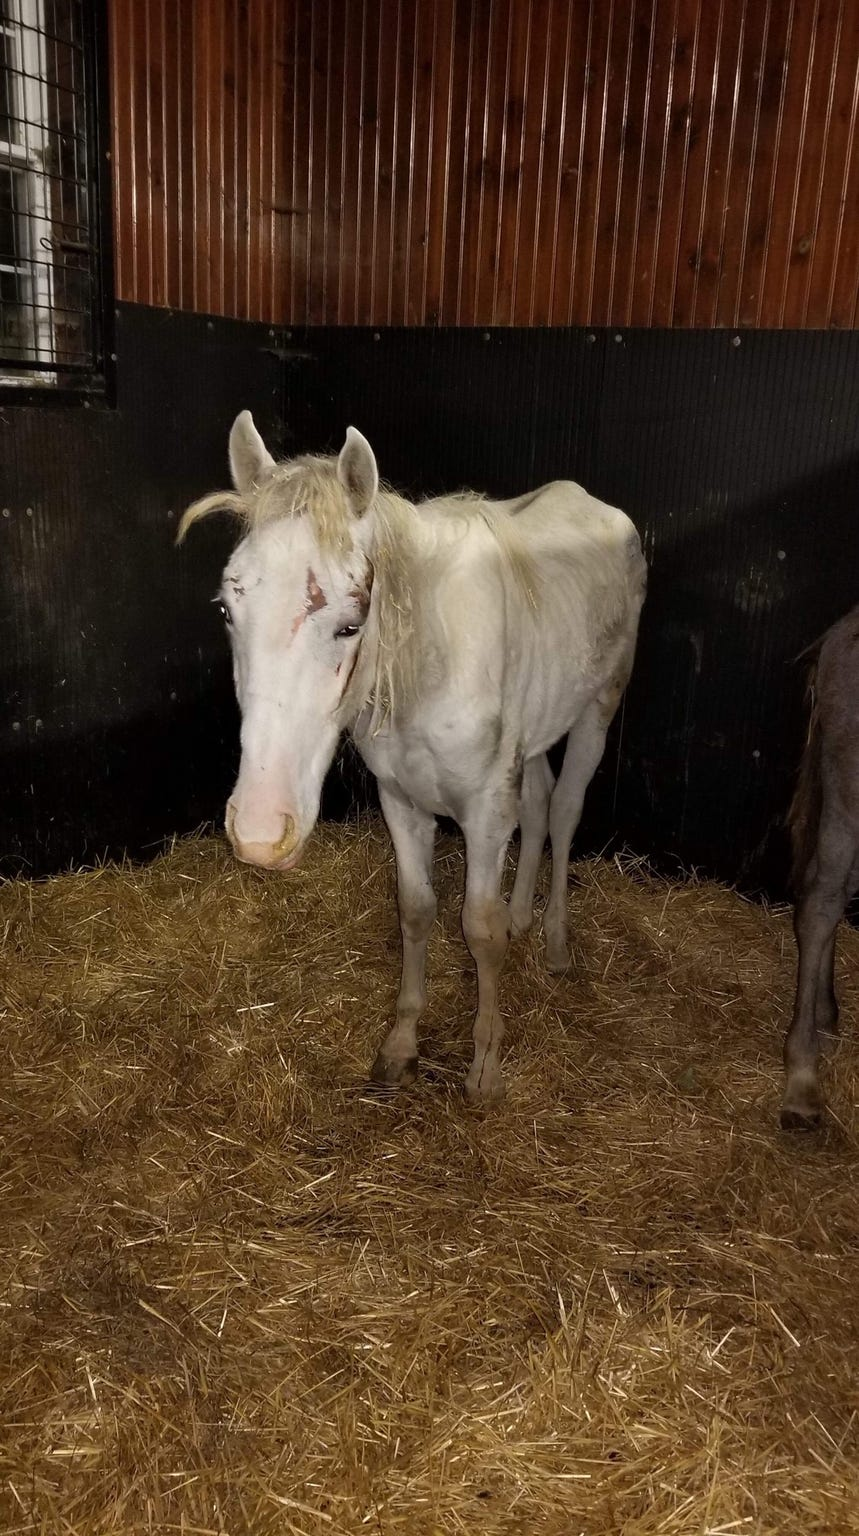 Vet claims horses were neglected at Lebanon County farm